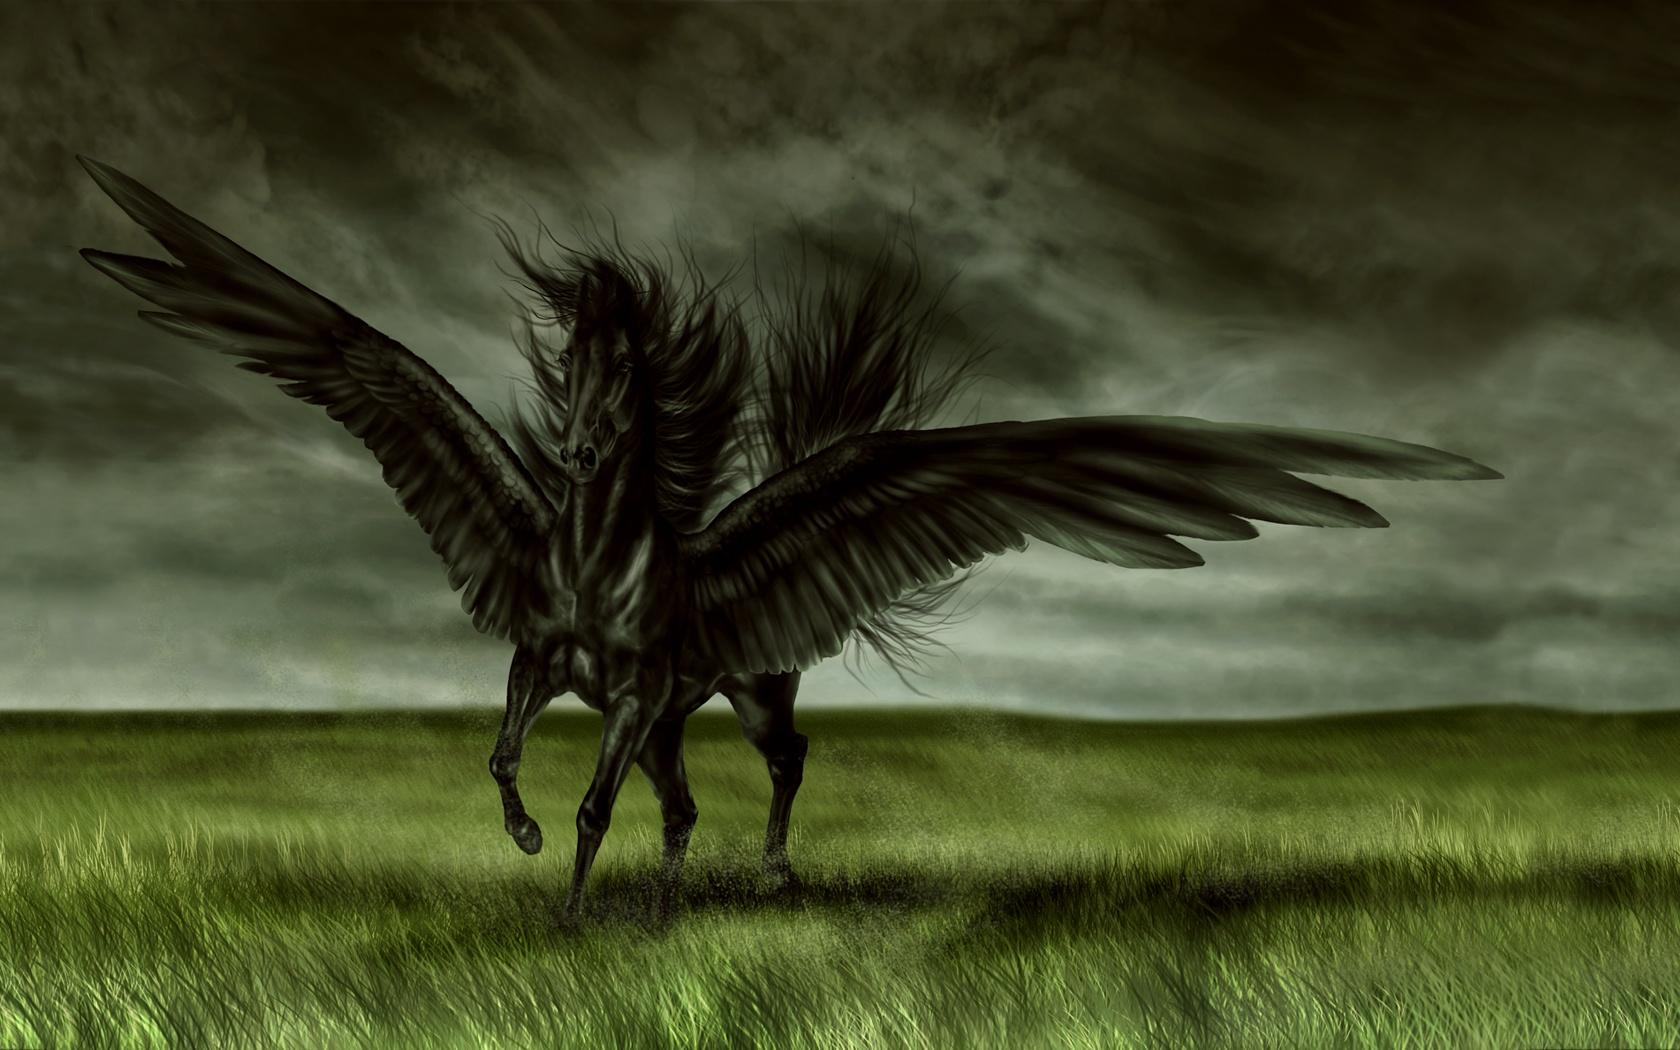 Cool Wallpaper Horse Magic - dark_fantasy_wallpaper_magic_horse-1680x1050  Snapshot_76755.jpg